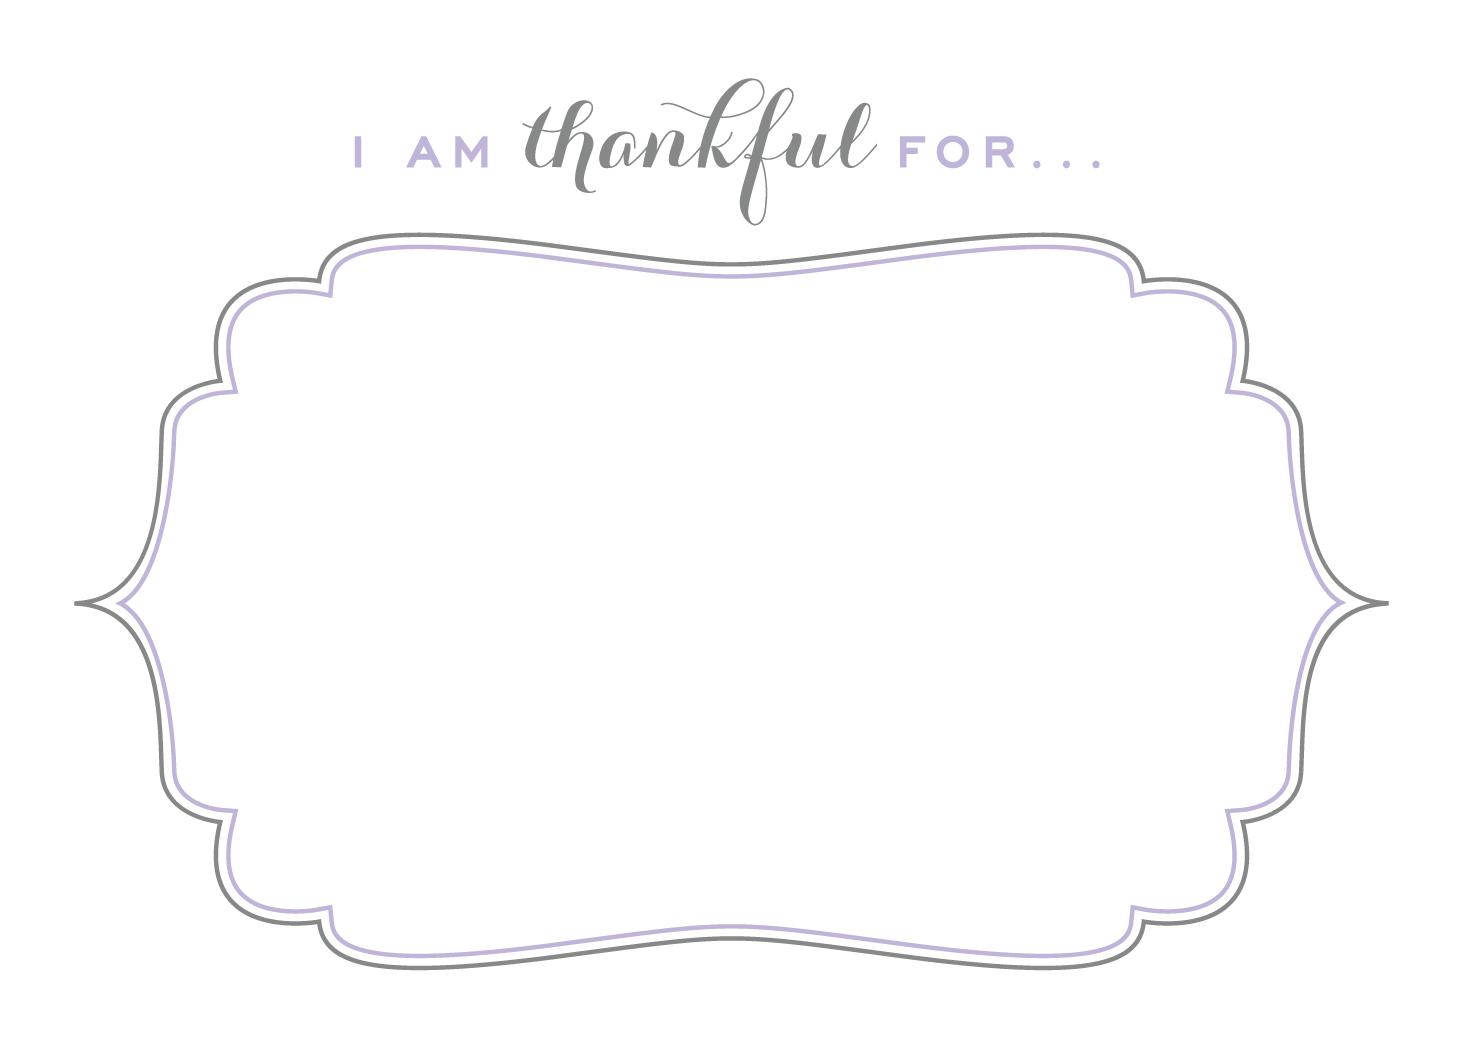 photo regarding I Am Thankful for Printable named I am grateful for Thanksgiving Thanksgiving initiatives